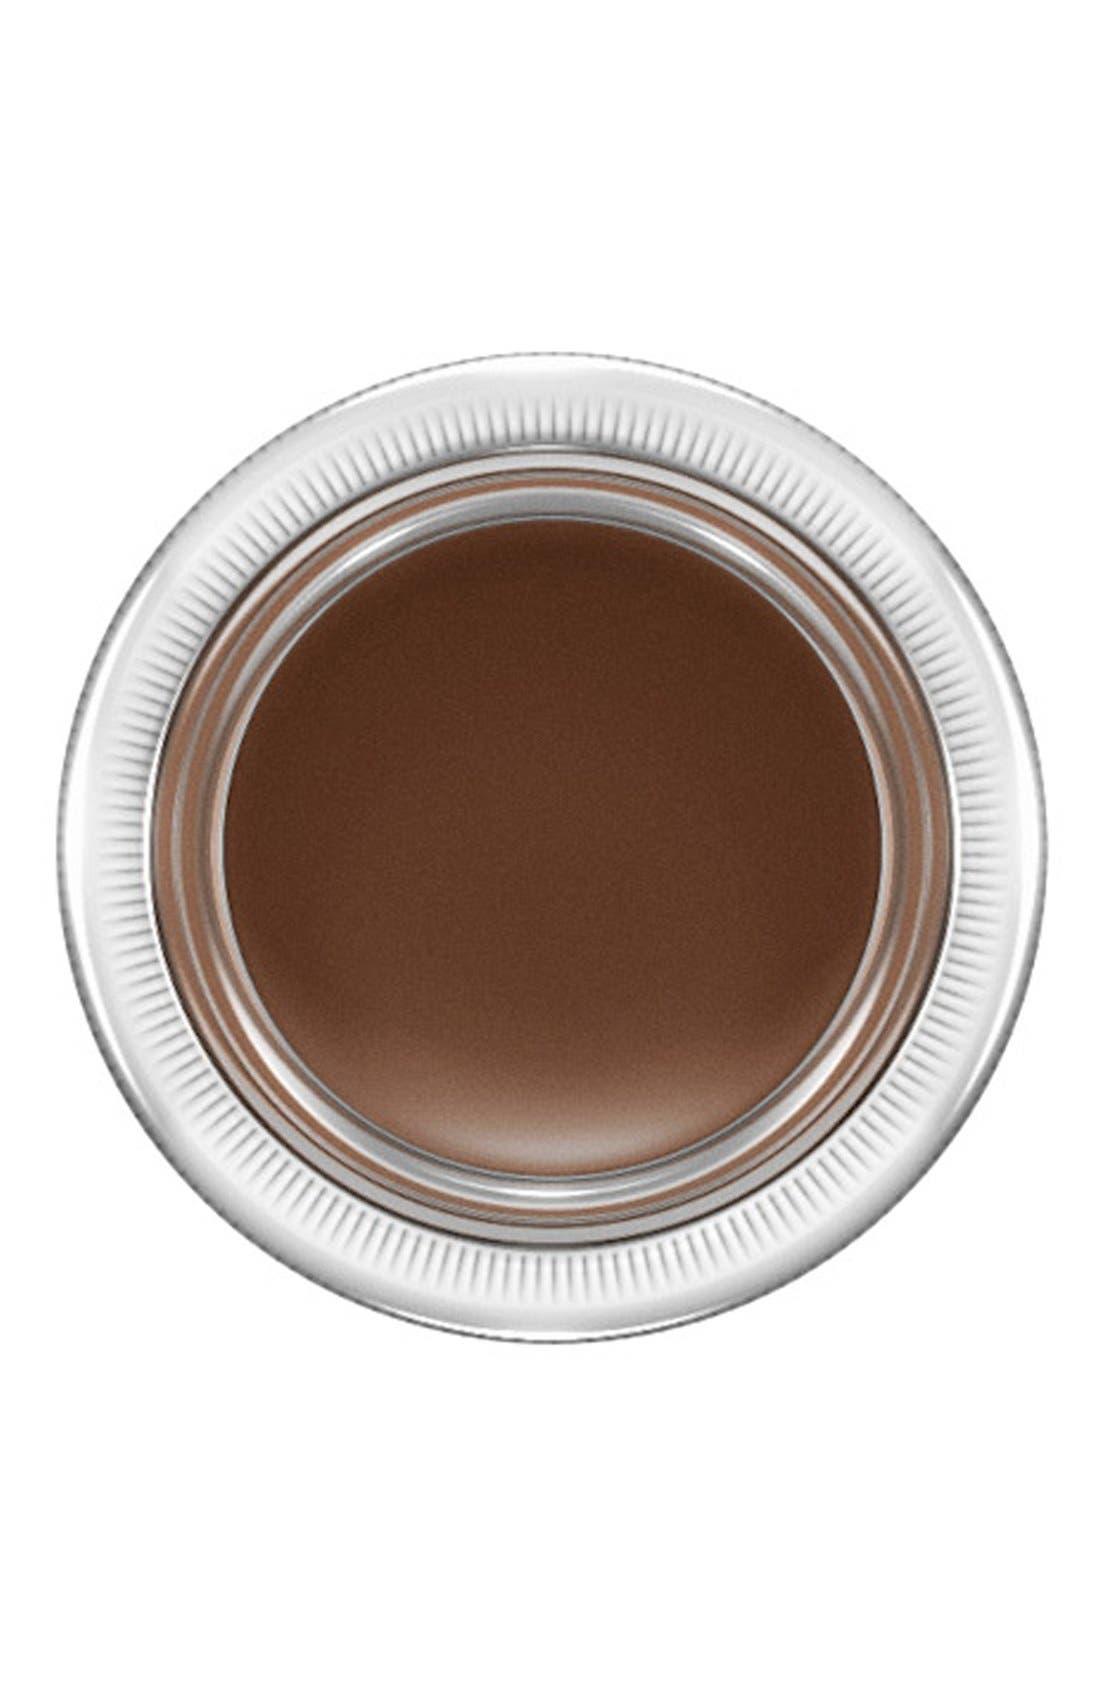 MAC 'Fluidline' Brow Gel